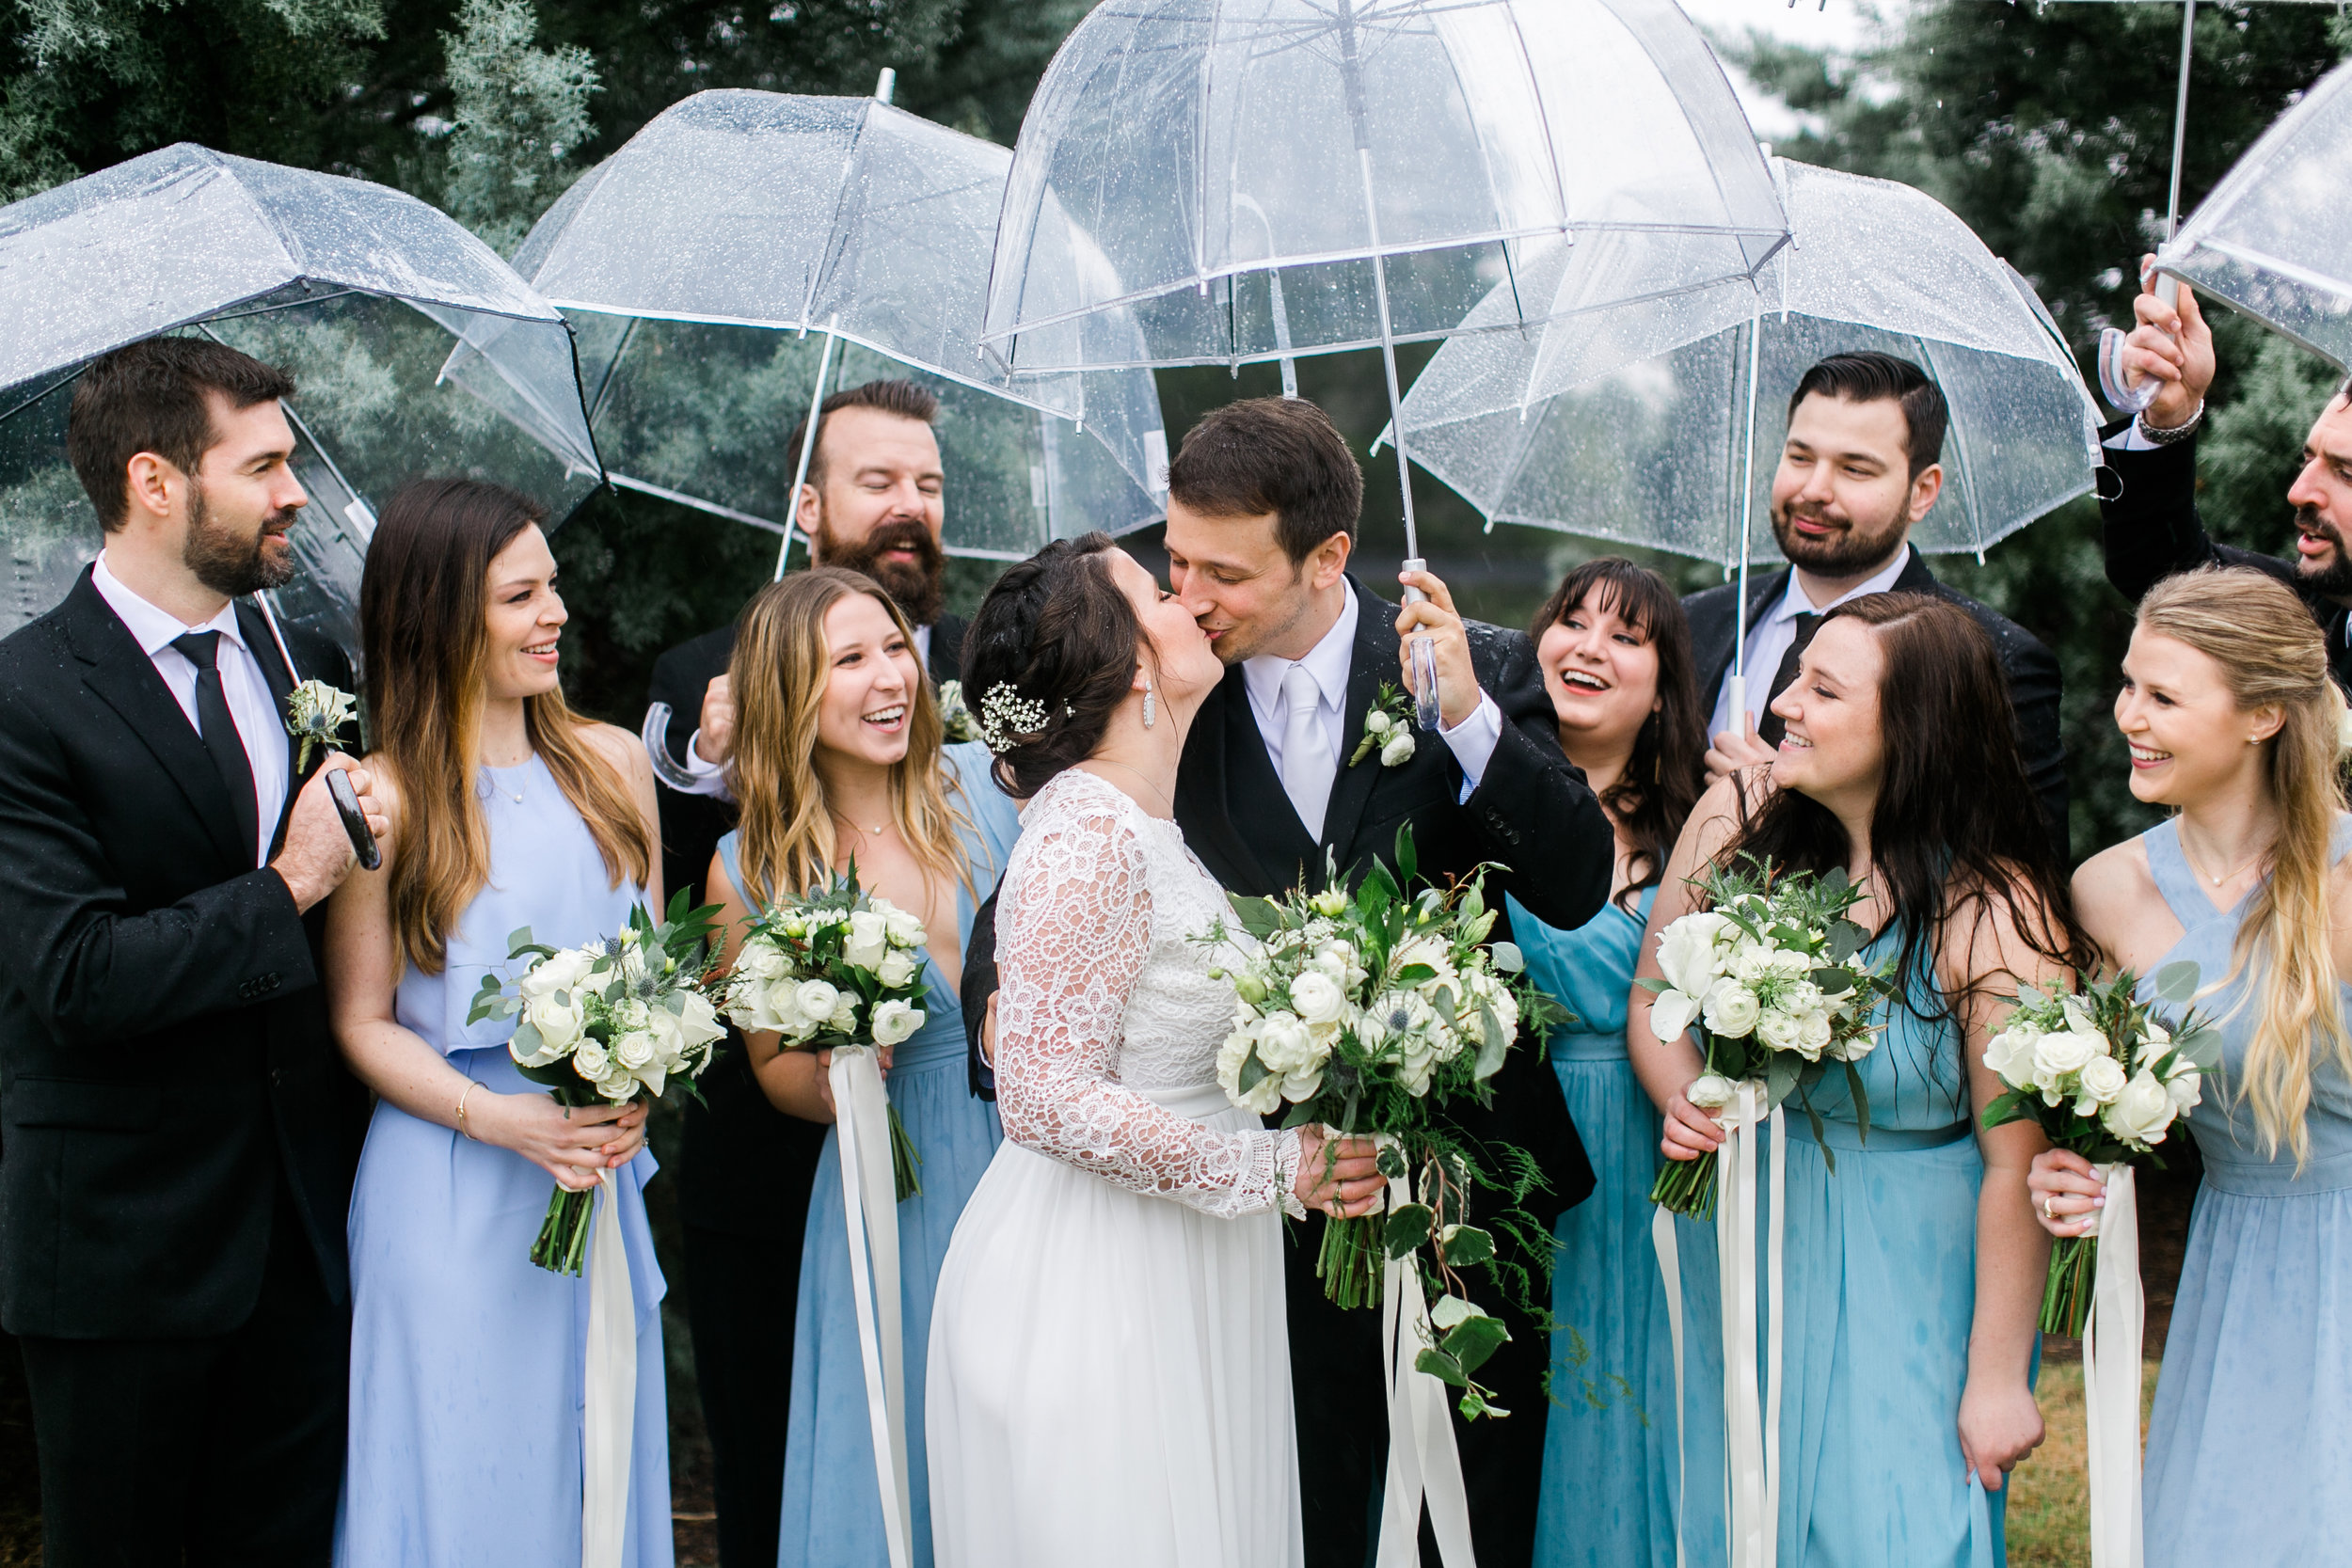 Austin_Texas_Fine_Art_Wedding_Photographer_Kayla_Snell_Photography_Antebellum_Oaks343.jpg